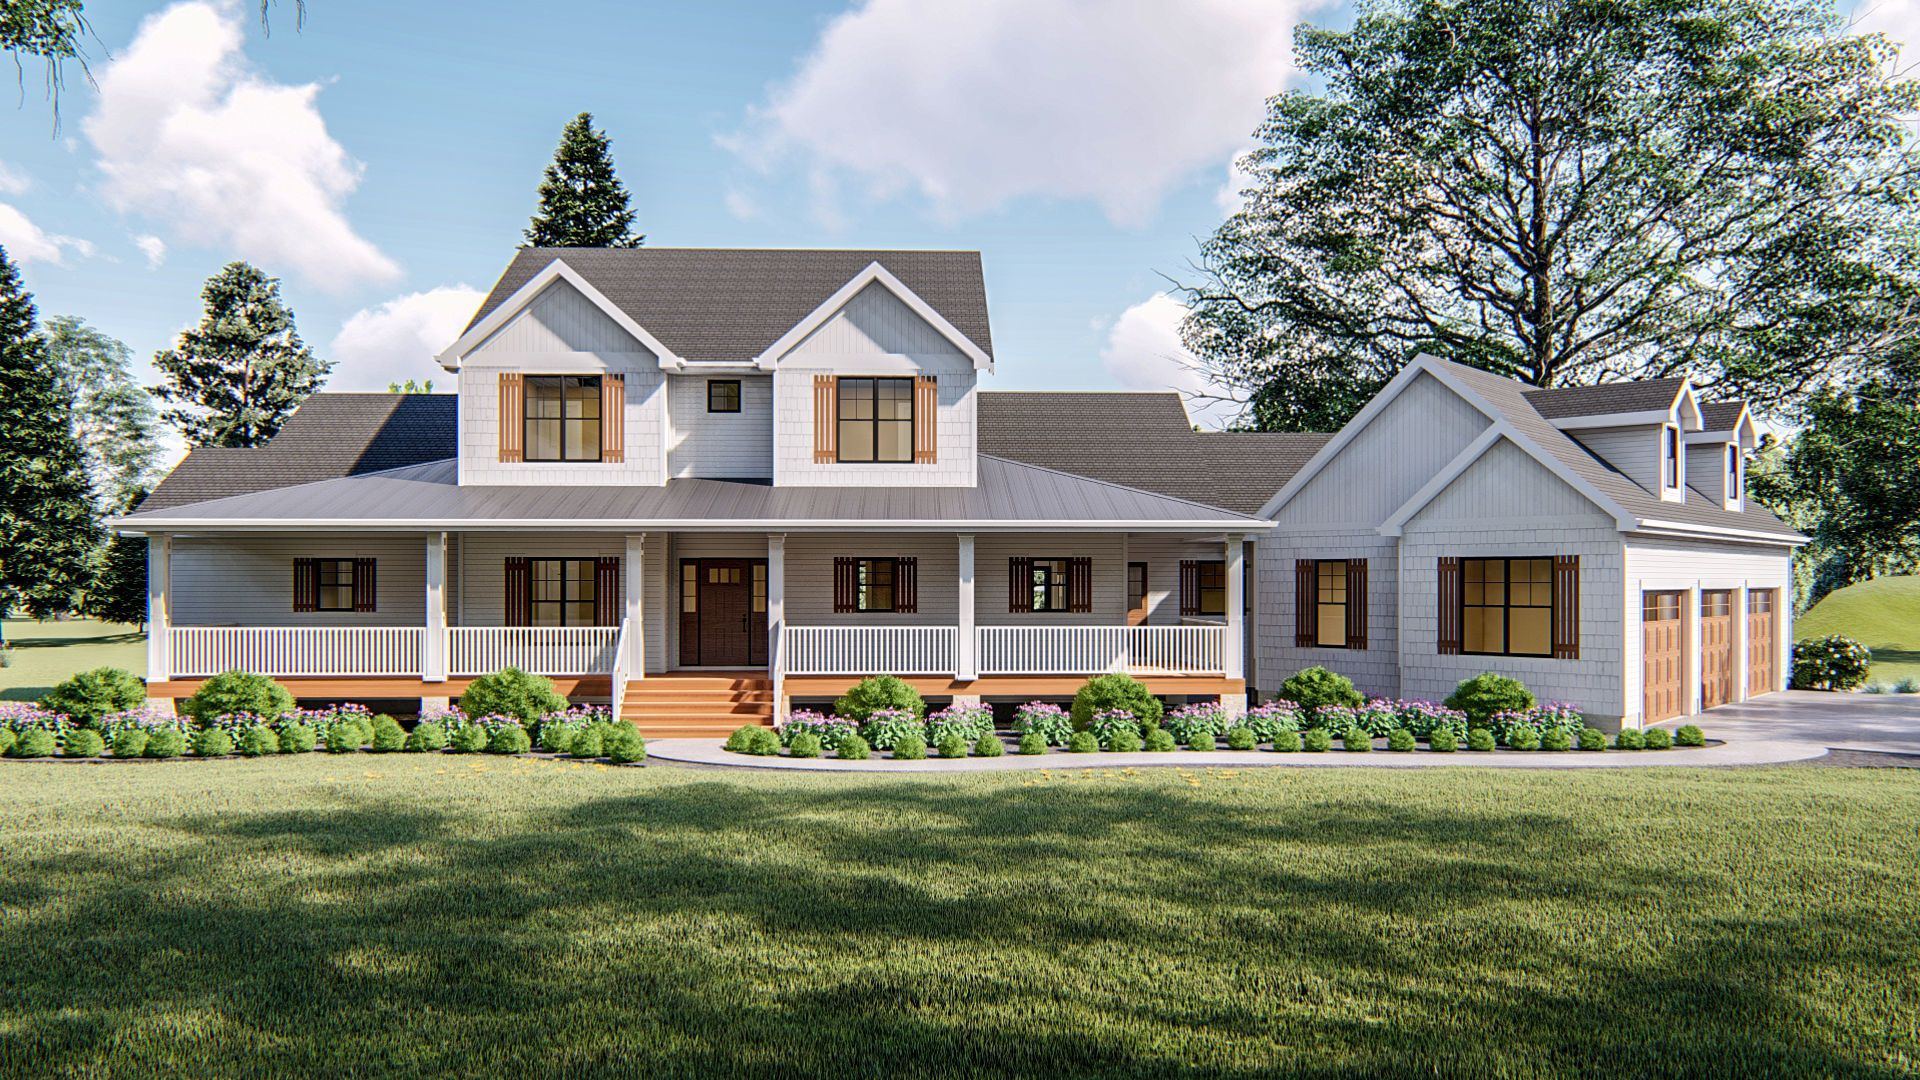 modern farmhouse exterior with wrap around porch